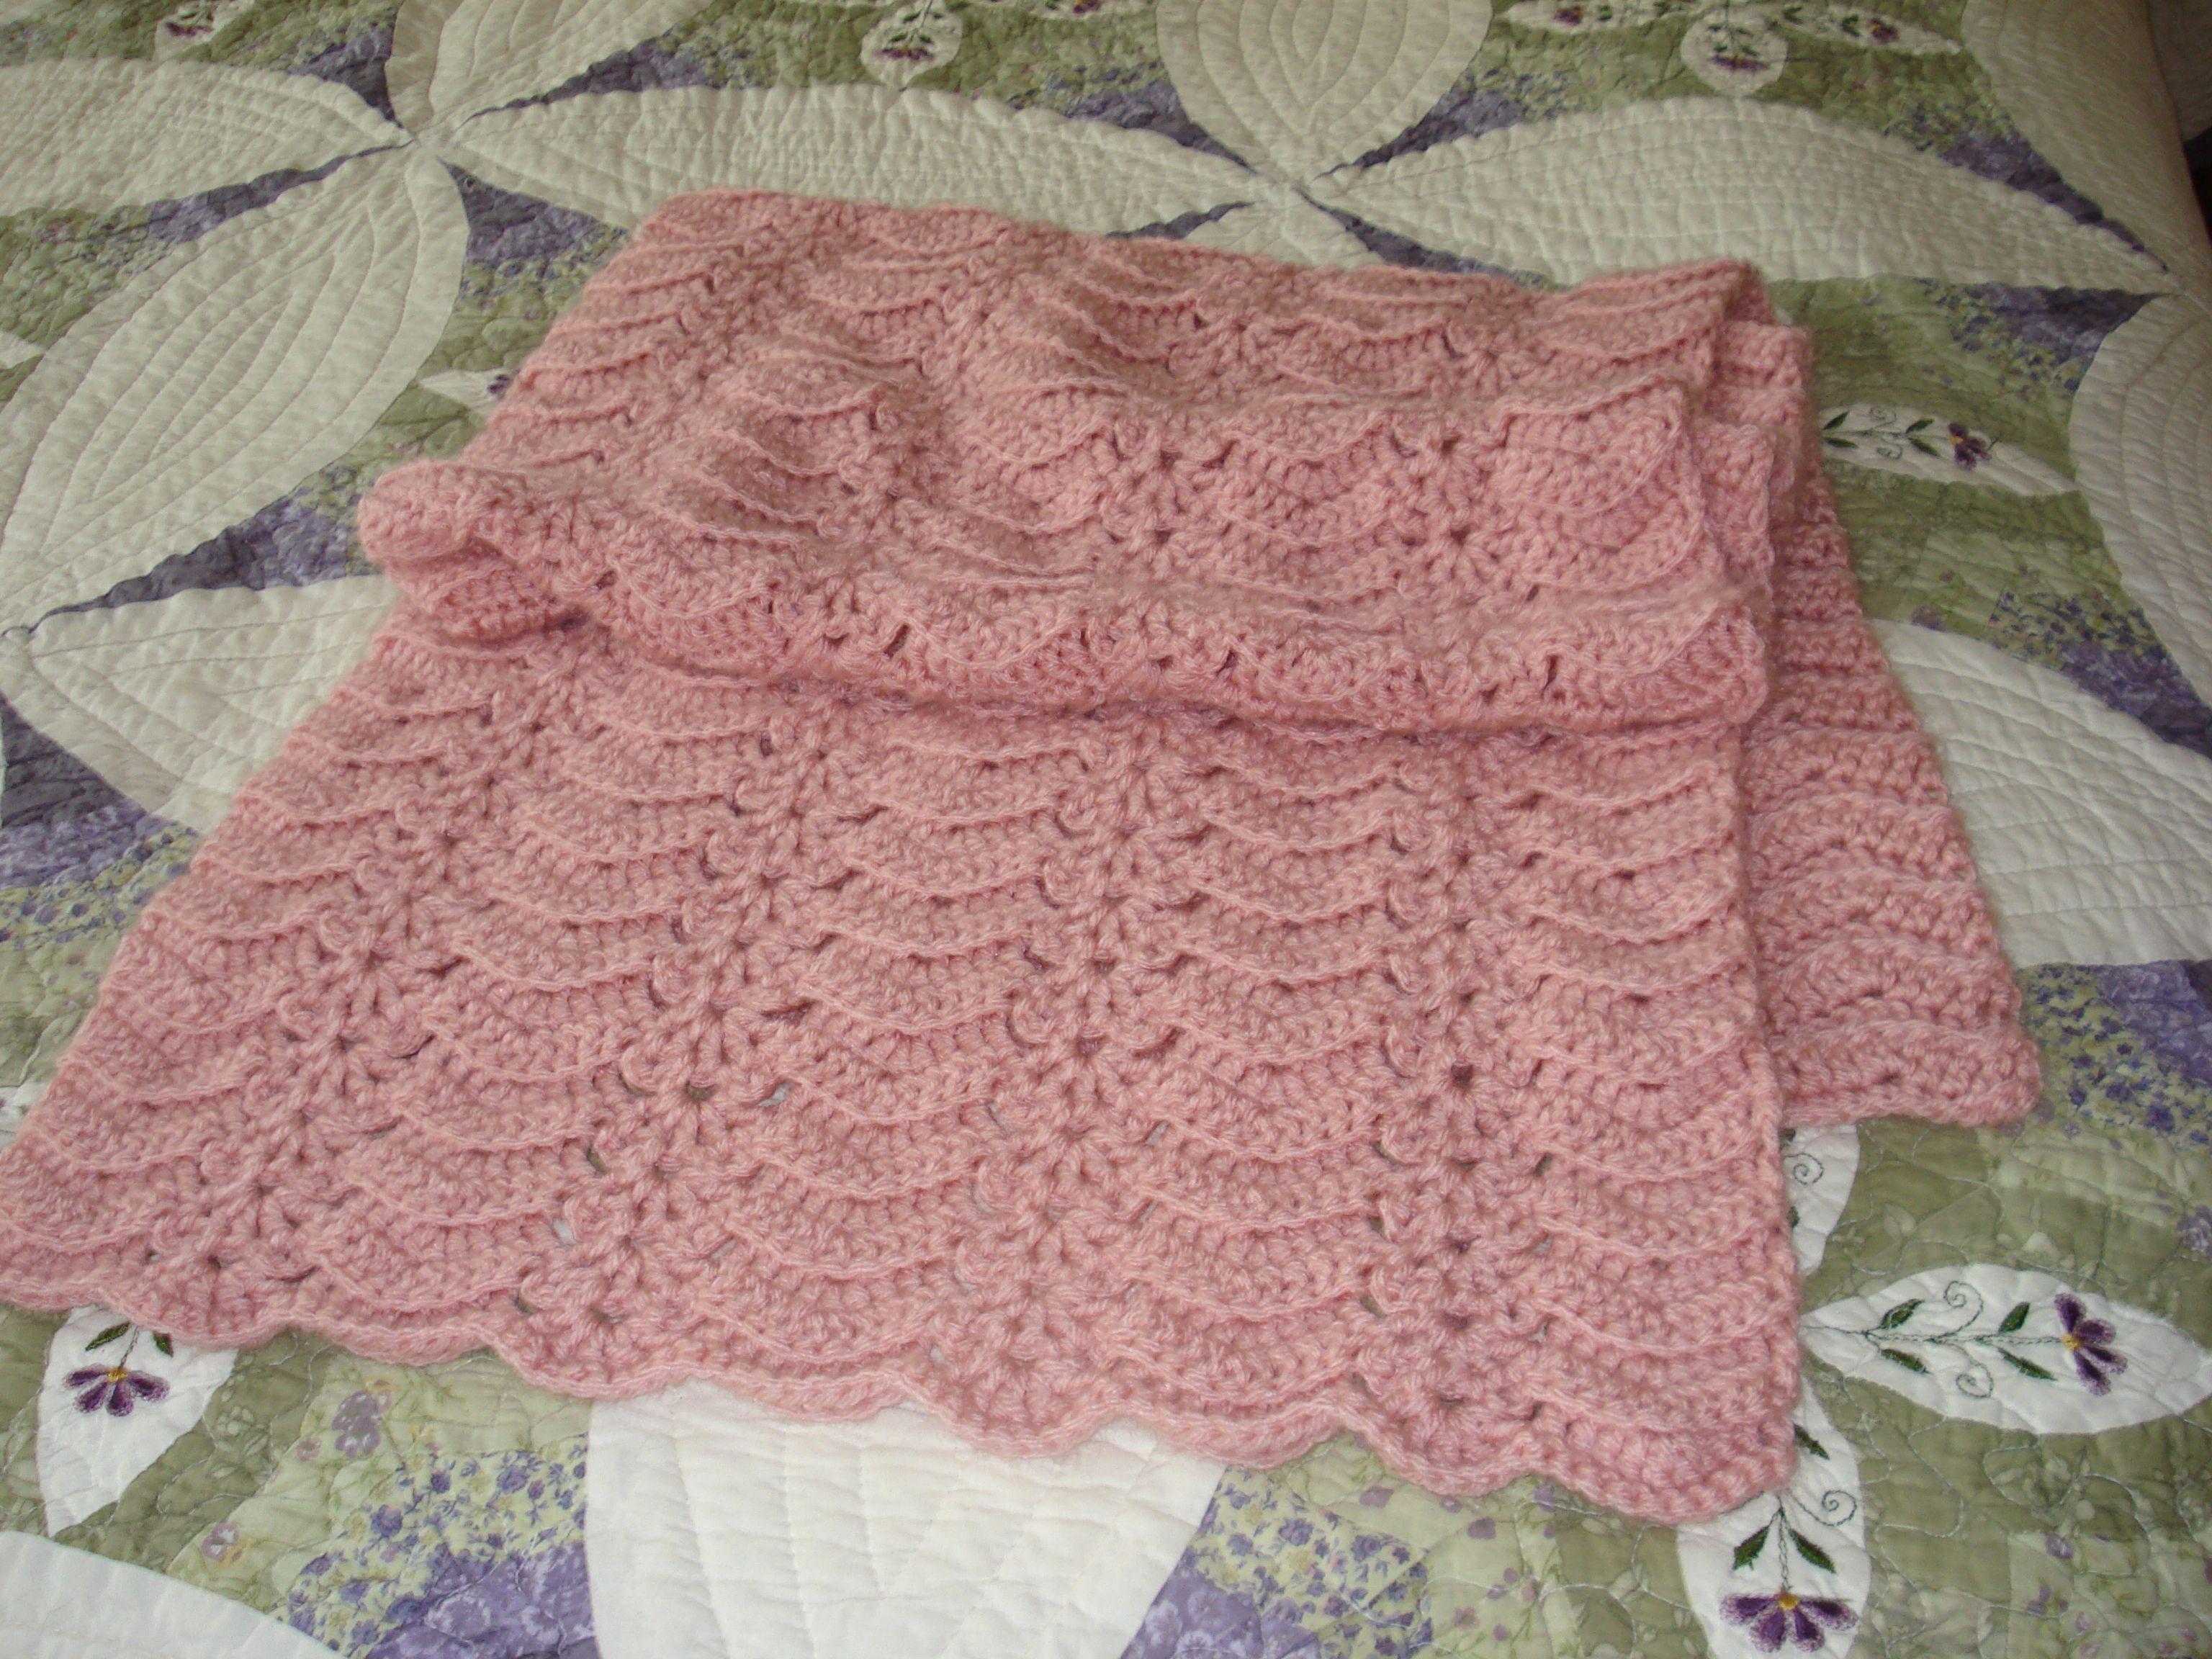 Crochet Shawls Patterns Free Only   ve been crocheting triangular ...